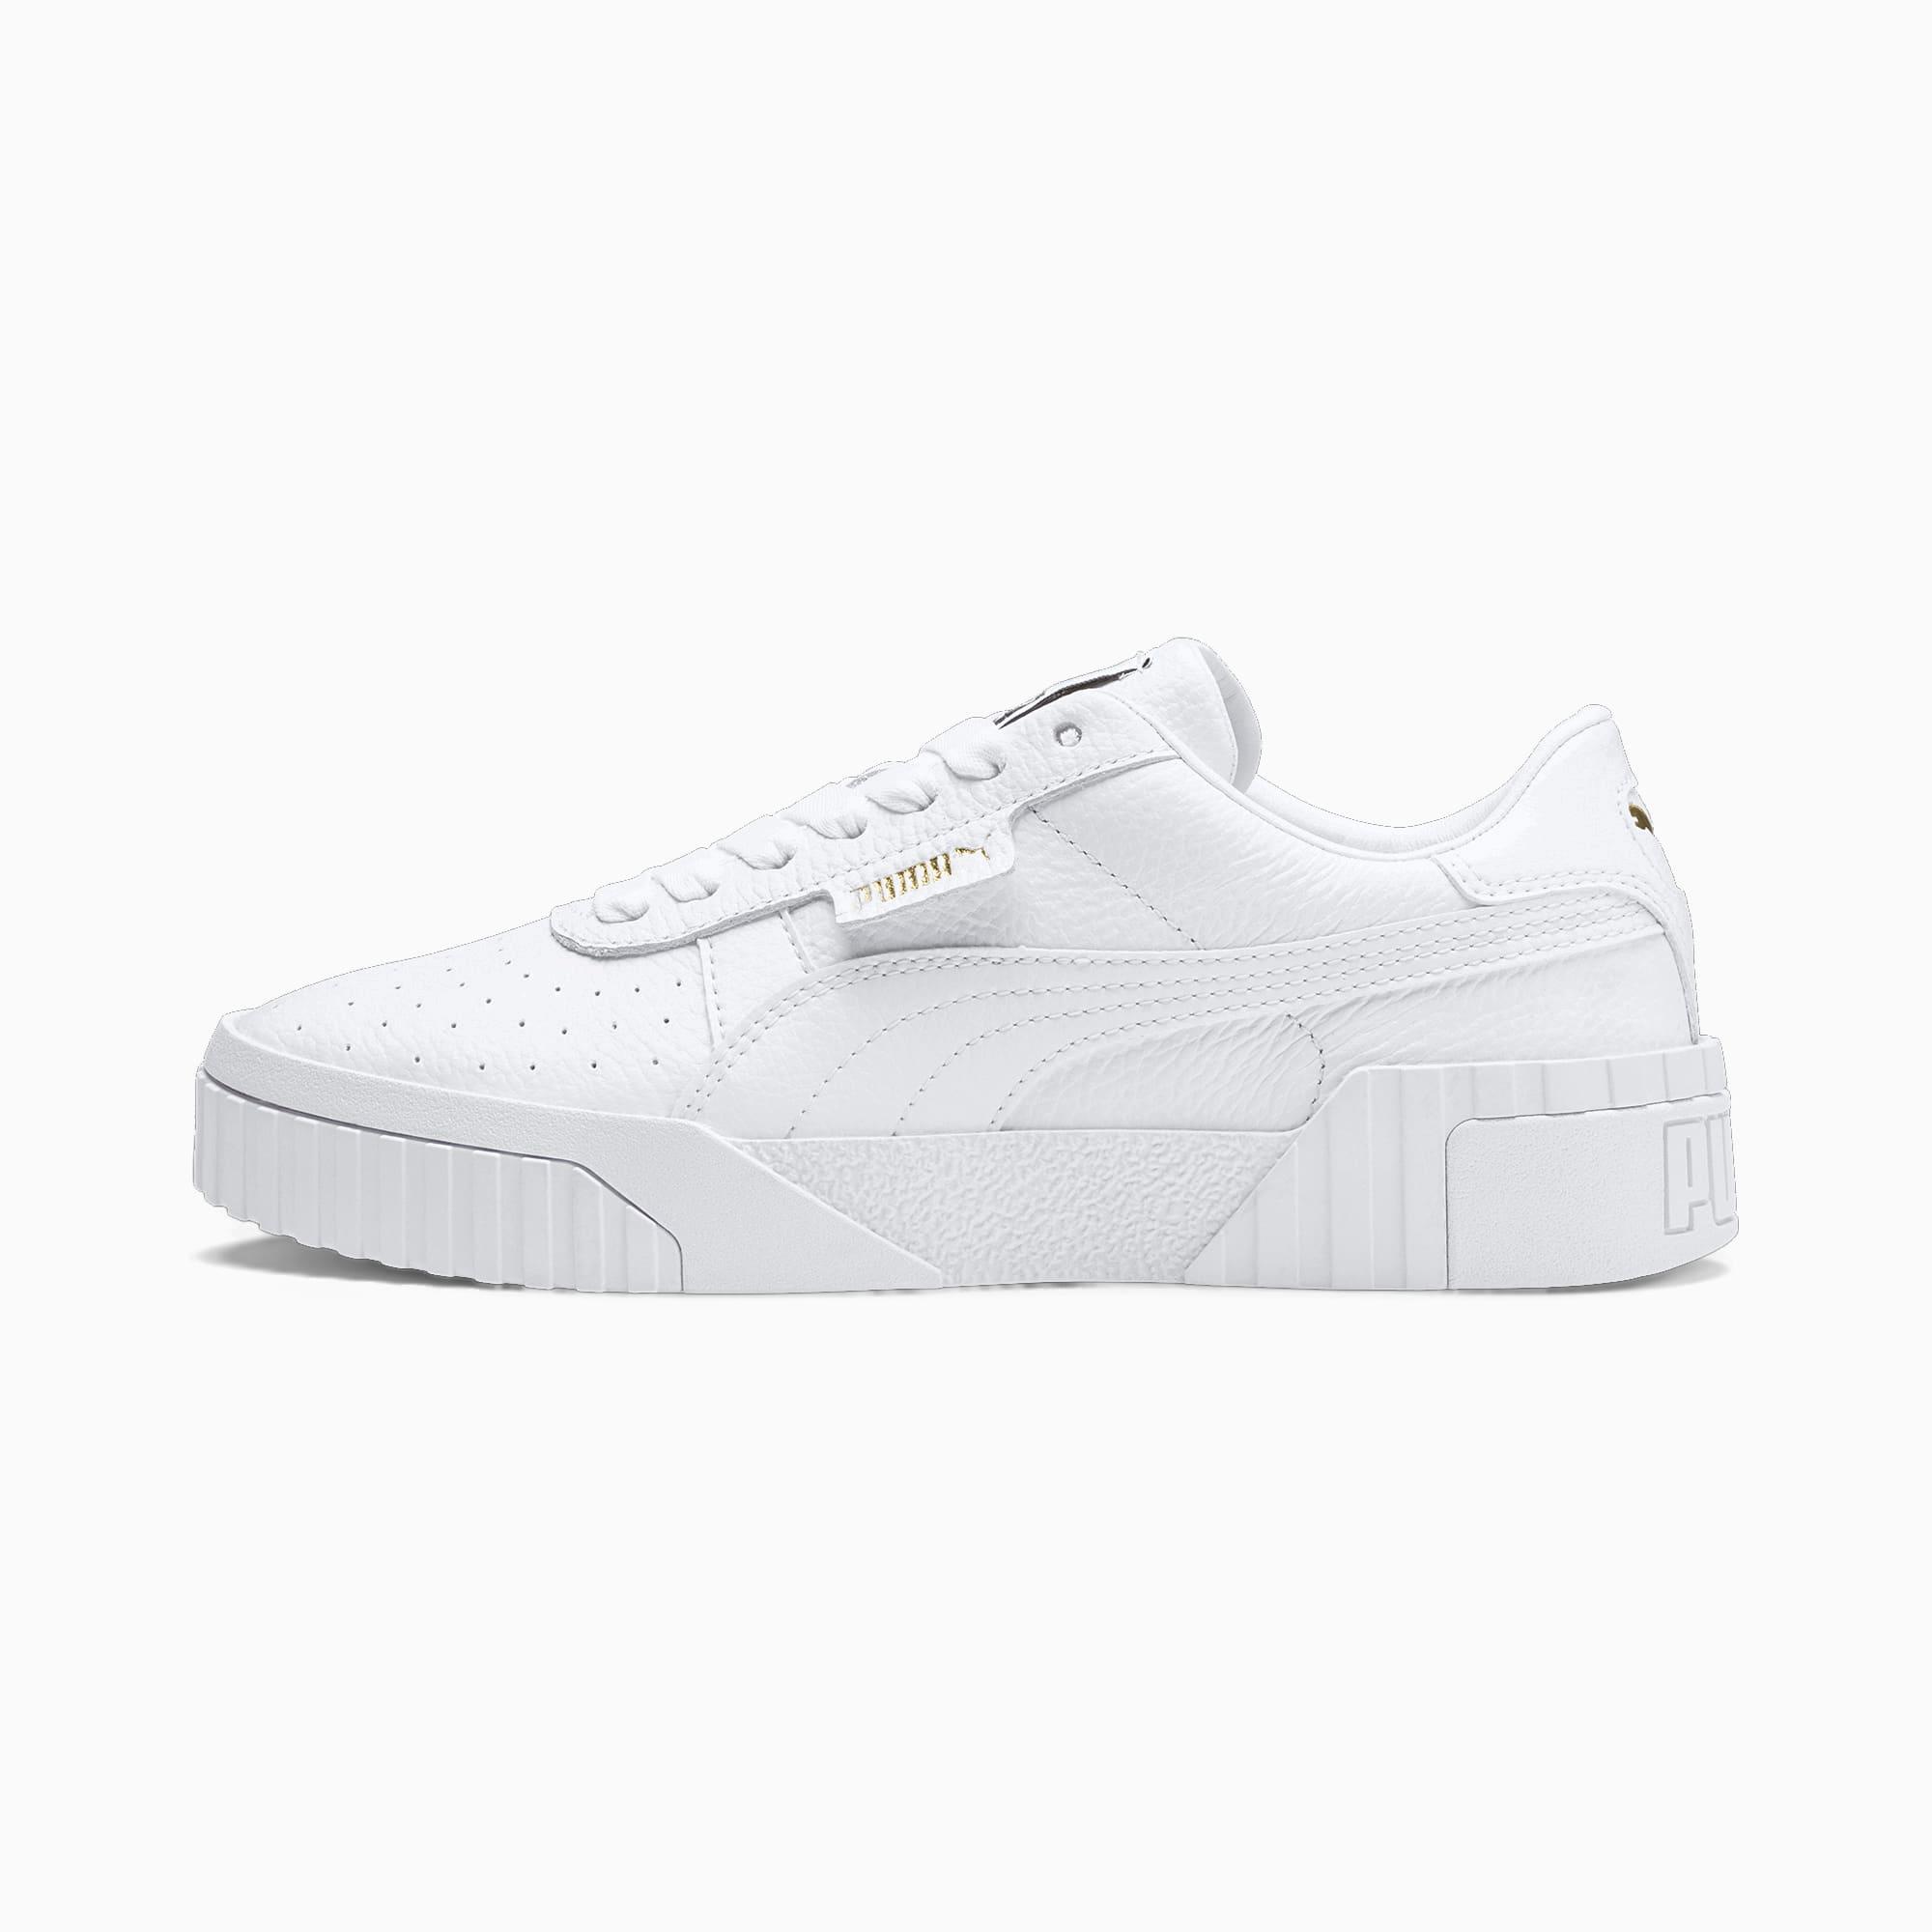 Image of PUMA Cali Damen Sneaker Schuhe | Mit Aucun | Weiß | Größe: 37